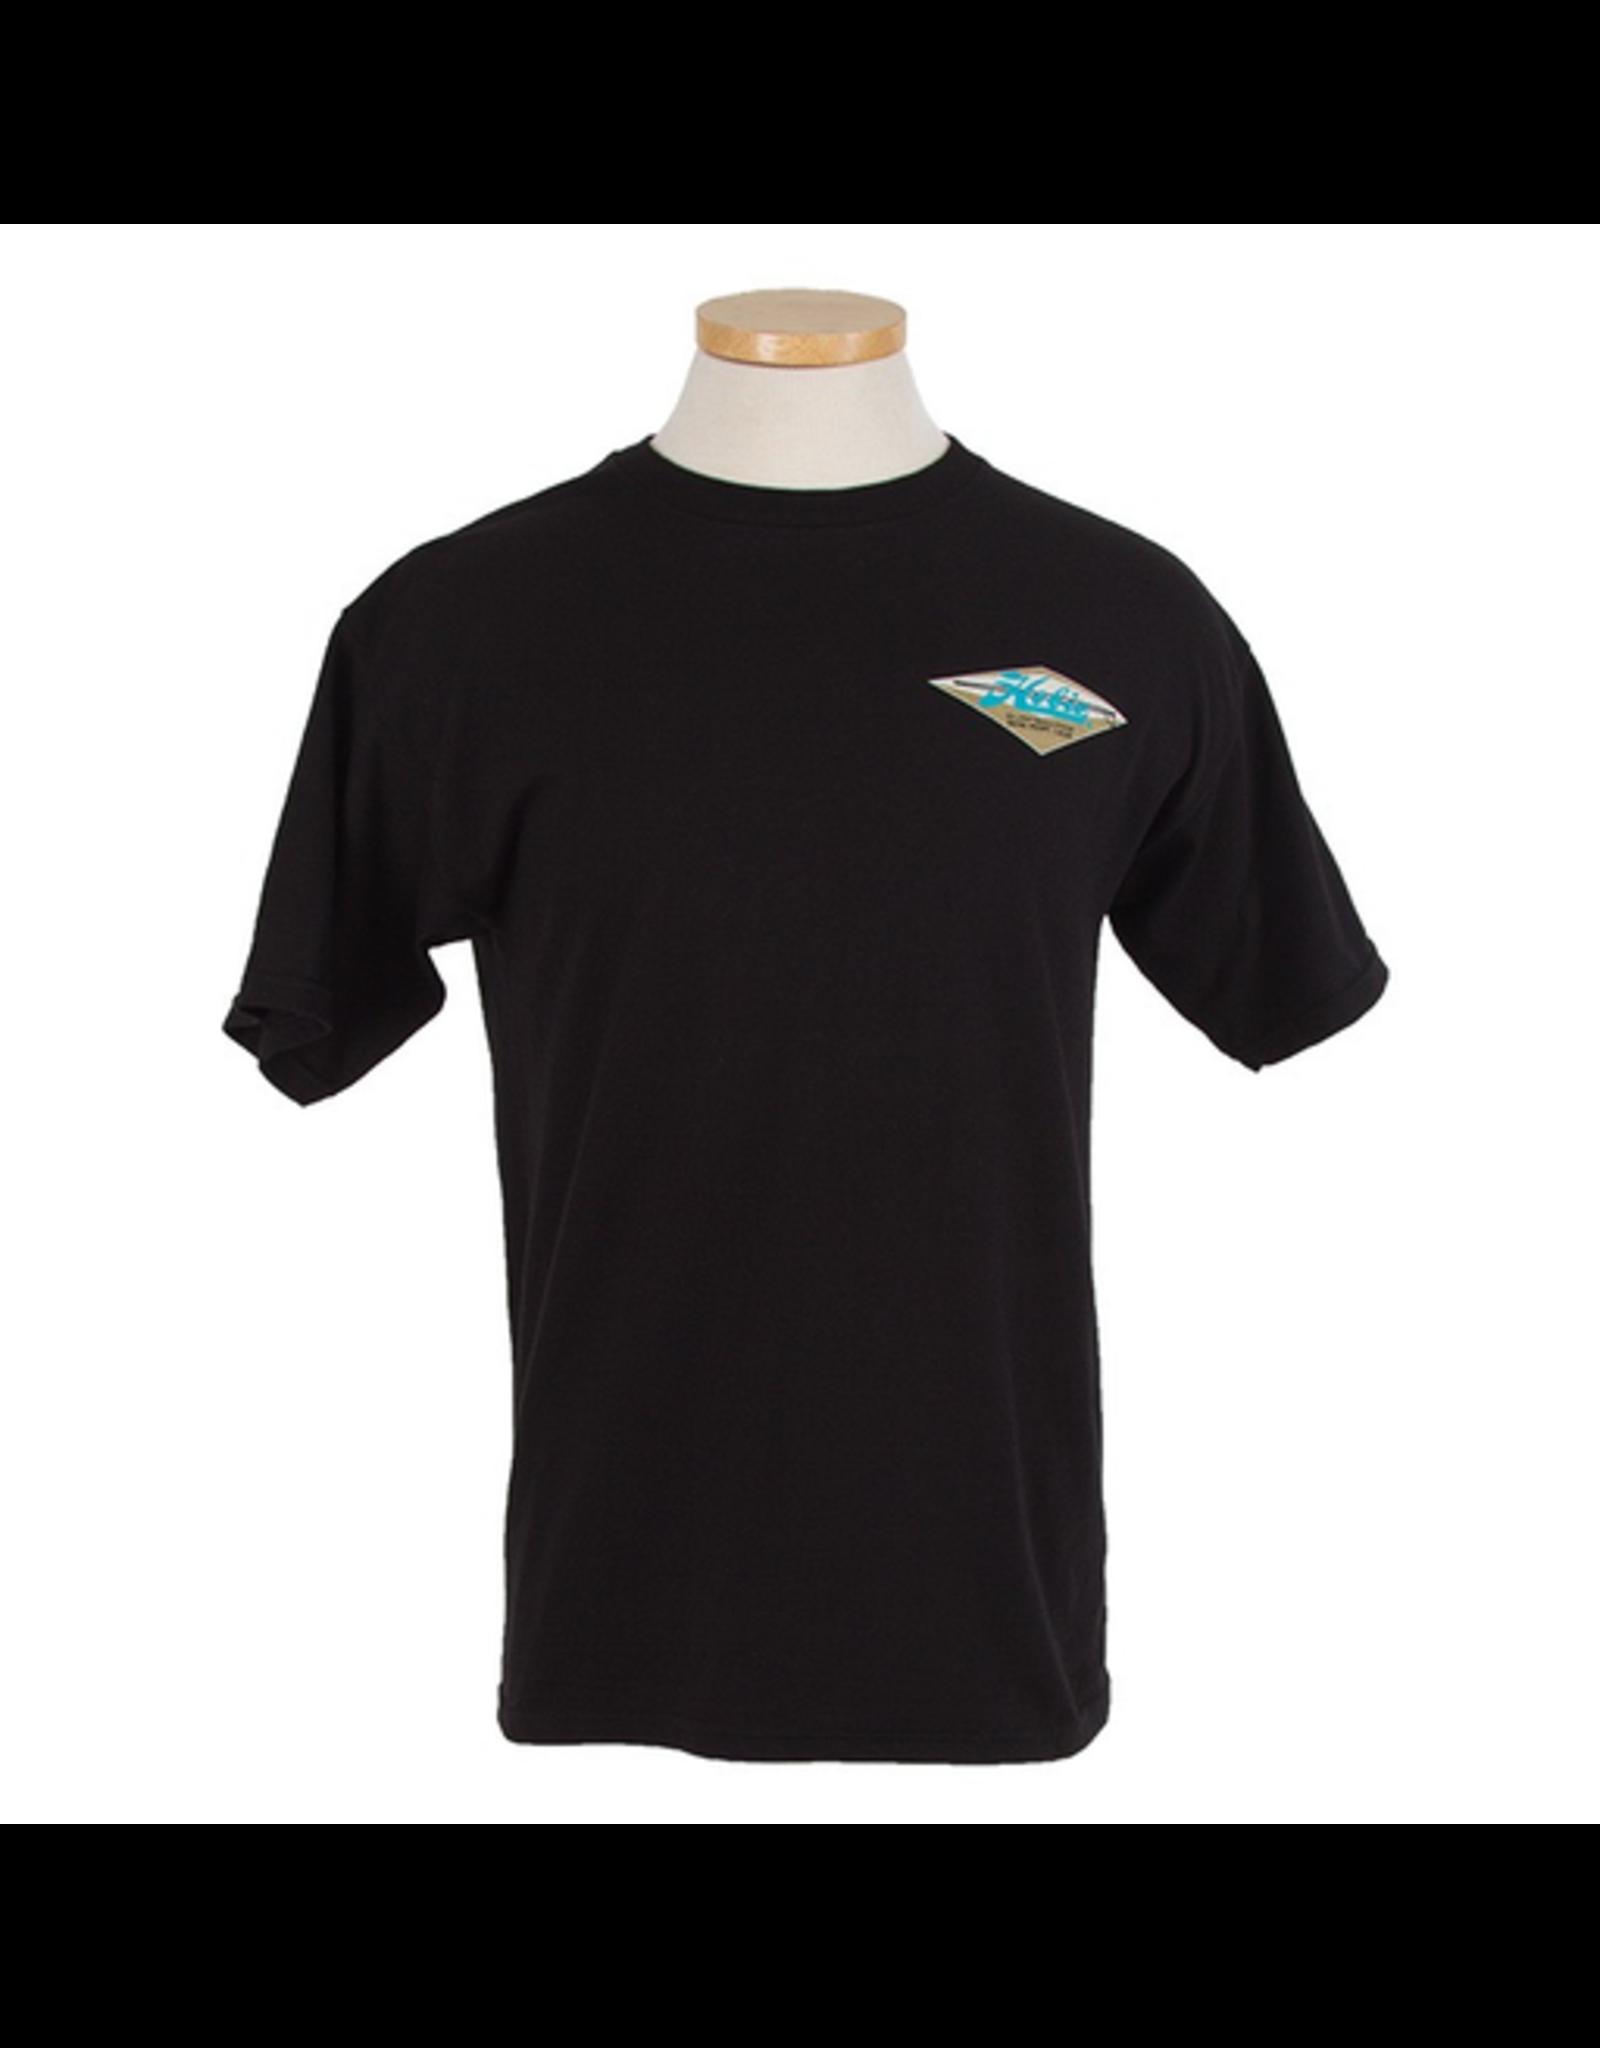 Hobie Hobie Classic Black T-shirt, Short Sleeve, Diamond